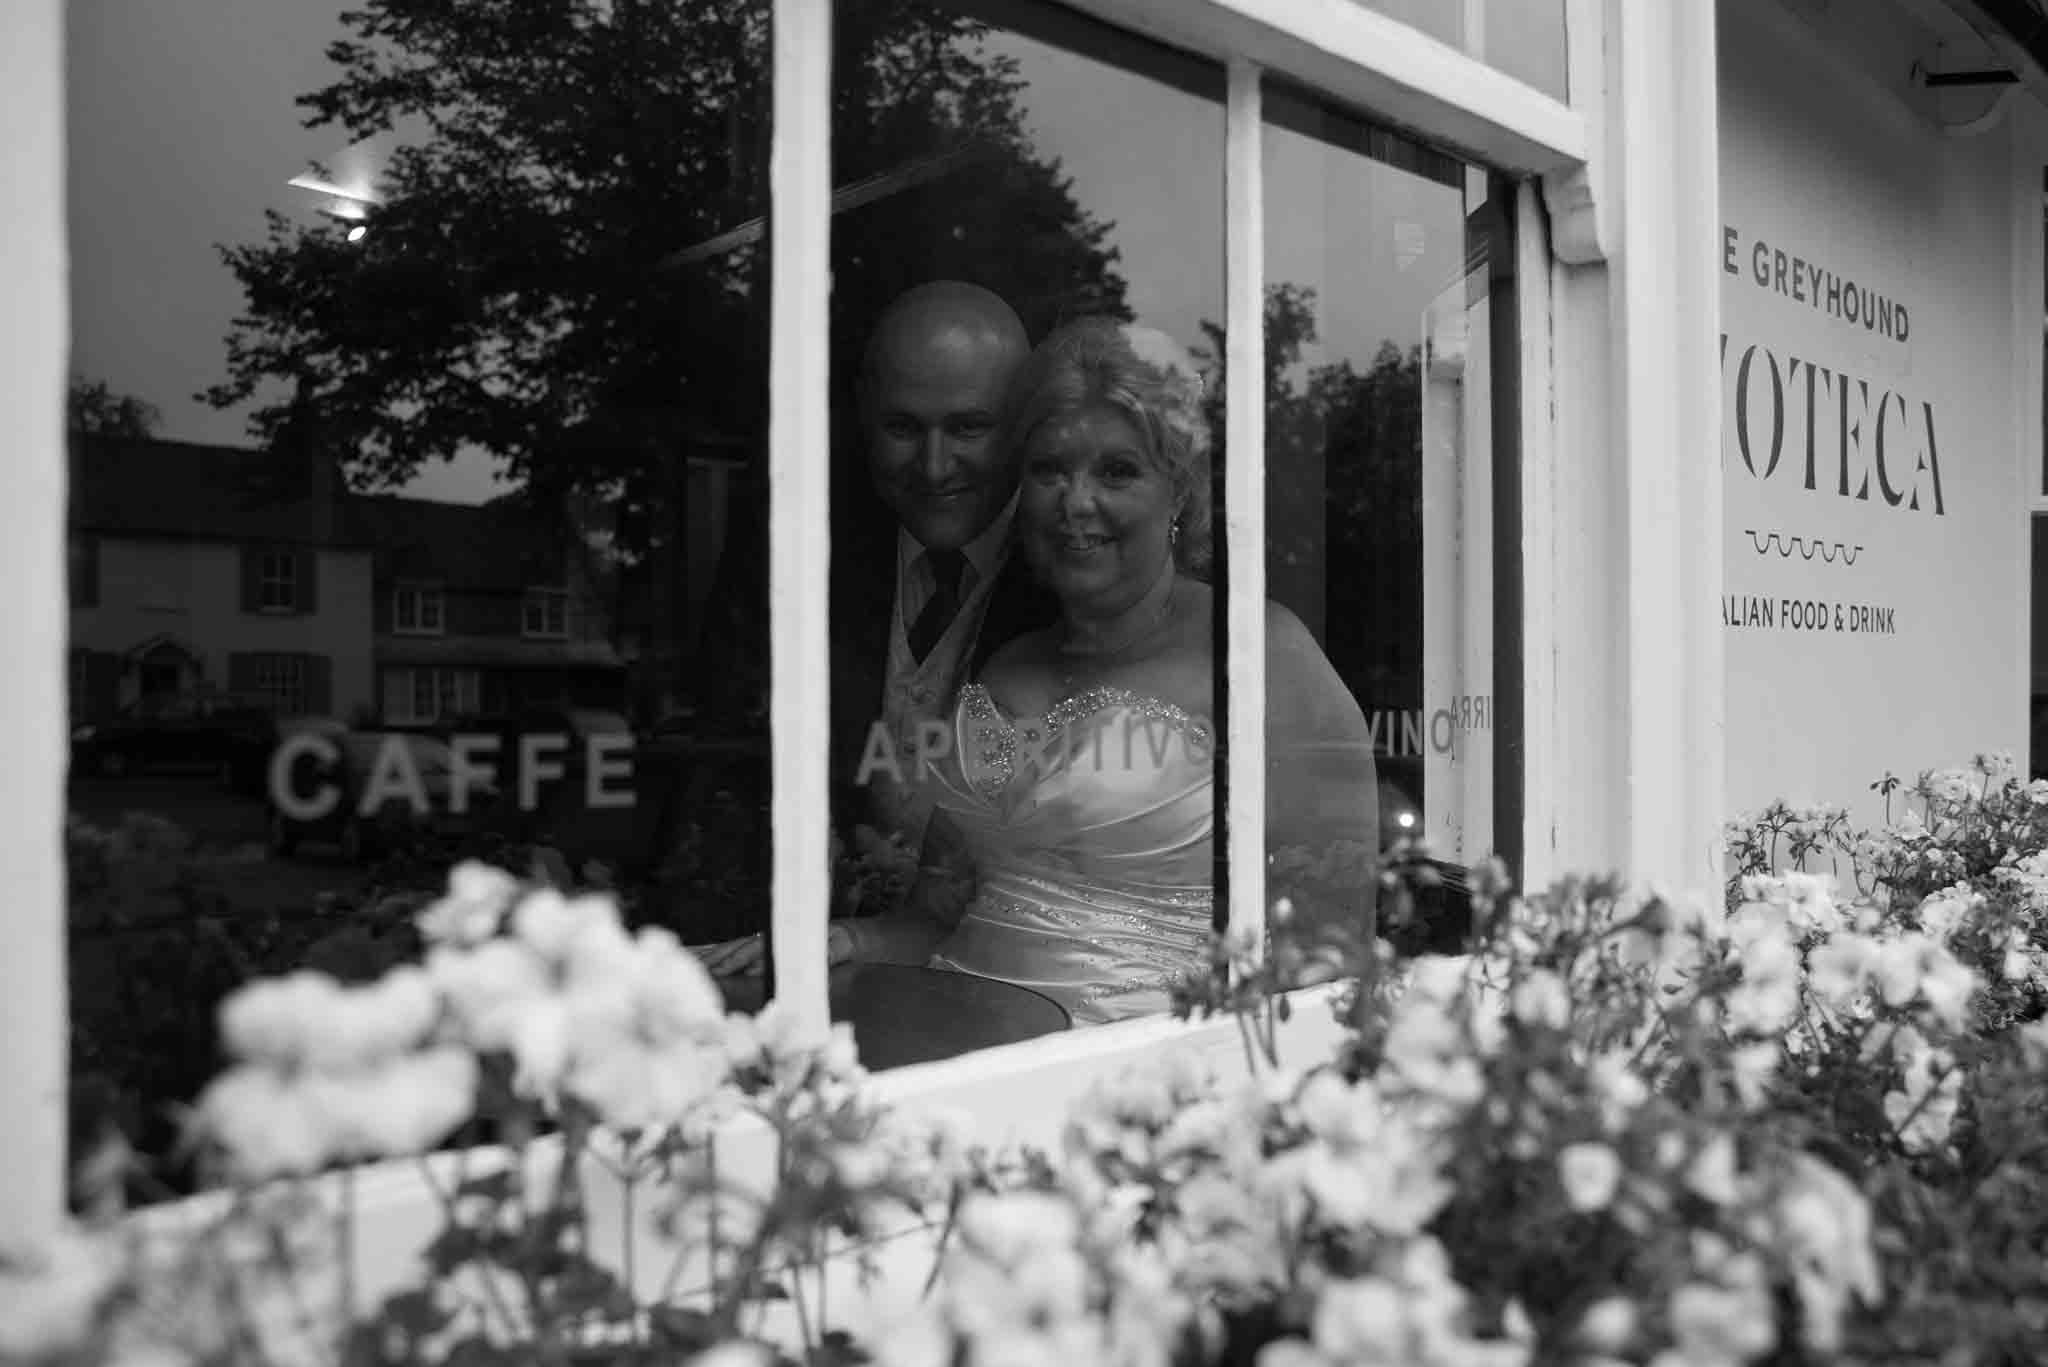 Greyhound Enoteca, St Mary & All Saints Beaconsfield, St Mary's Beaconsfield, Beaconsfield wedding photographer, Beaconsfield wedding, Buckinghamshire wedding, Reportage wedding photography